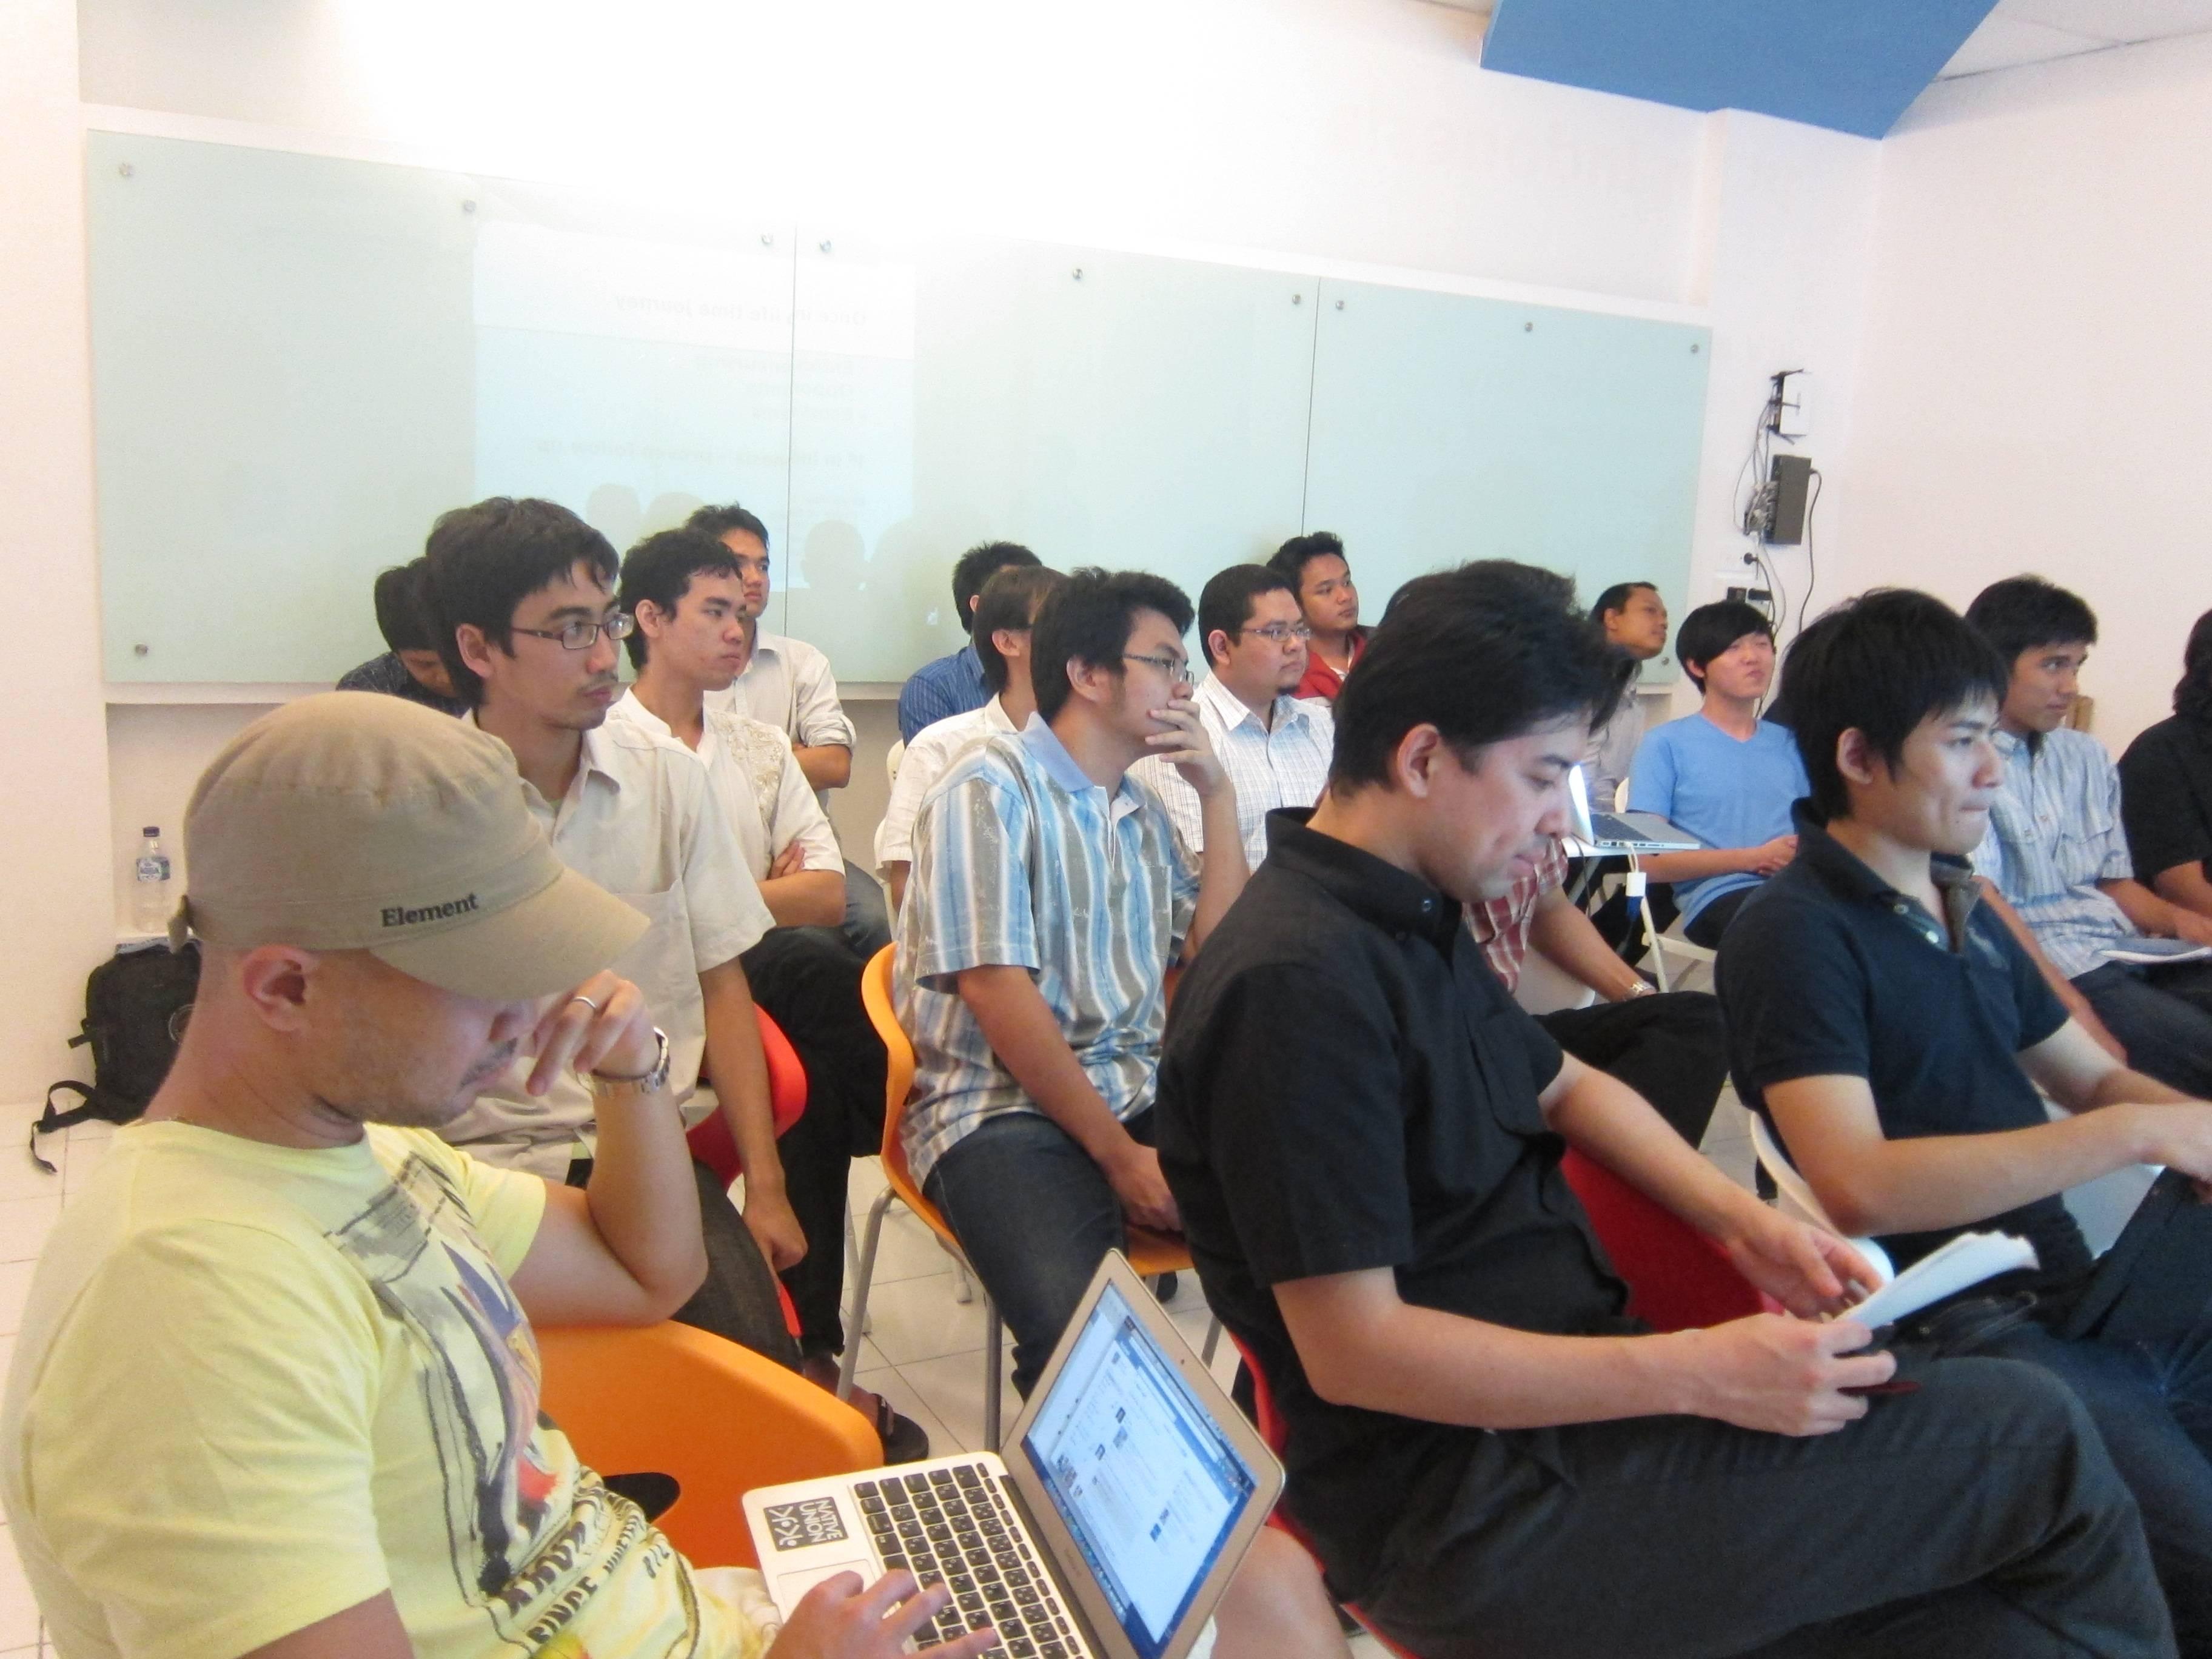 Batara-Taiga-and-startups